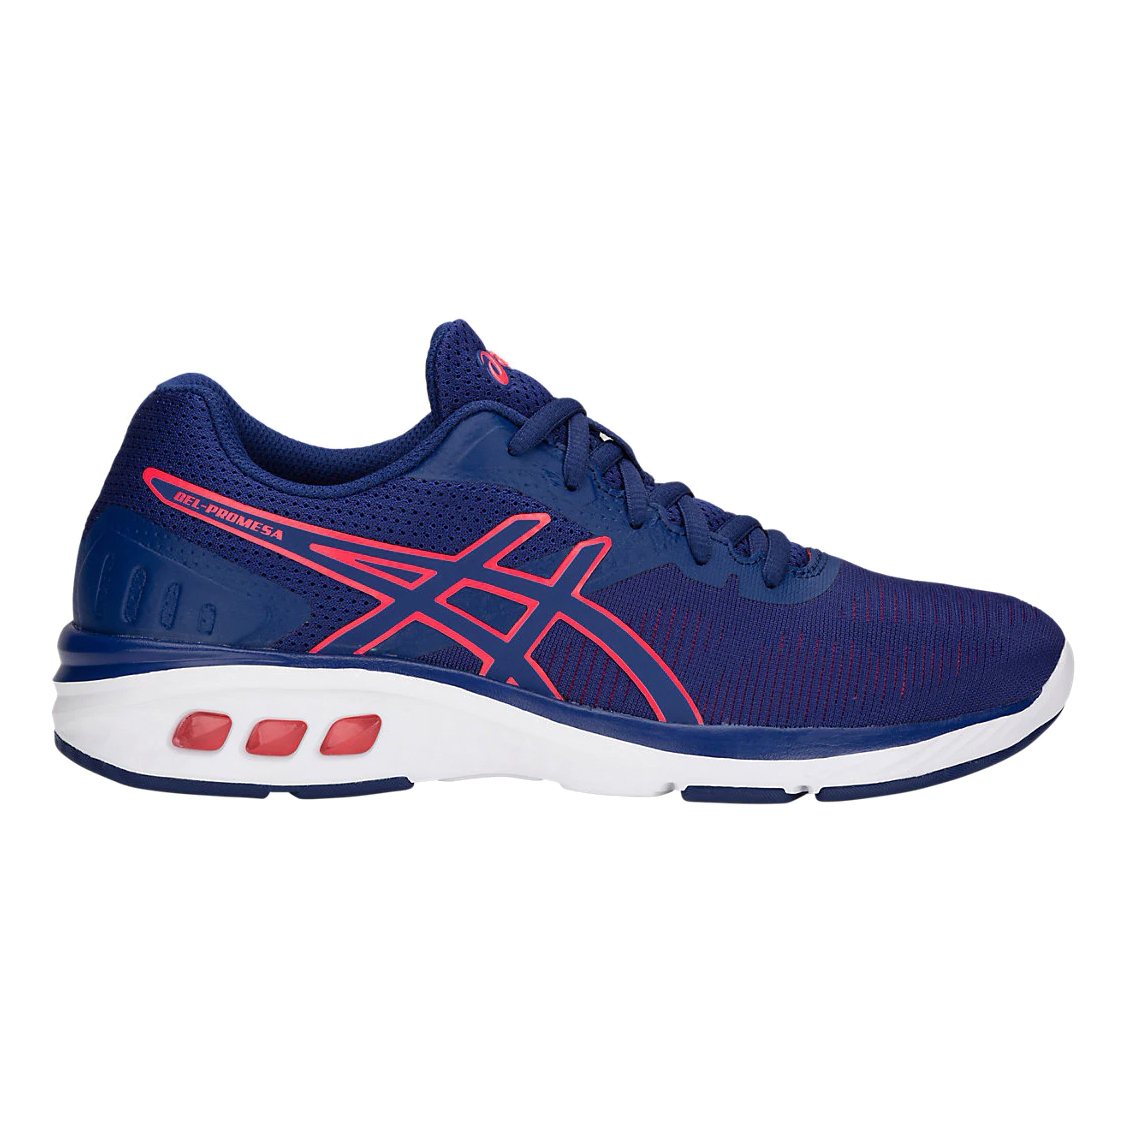 Sport Shoes ASICS (GEL-PROMESA) Women TmallFS SportFS male polo asics 141160 8010 sports and entertainment for men sport clothes tmallfs